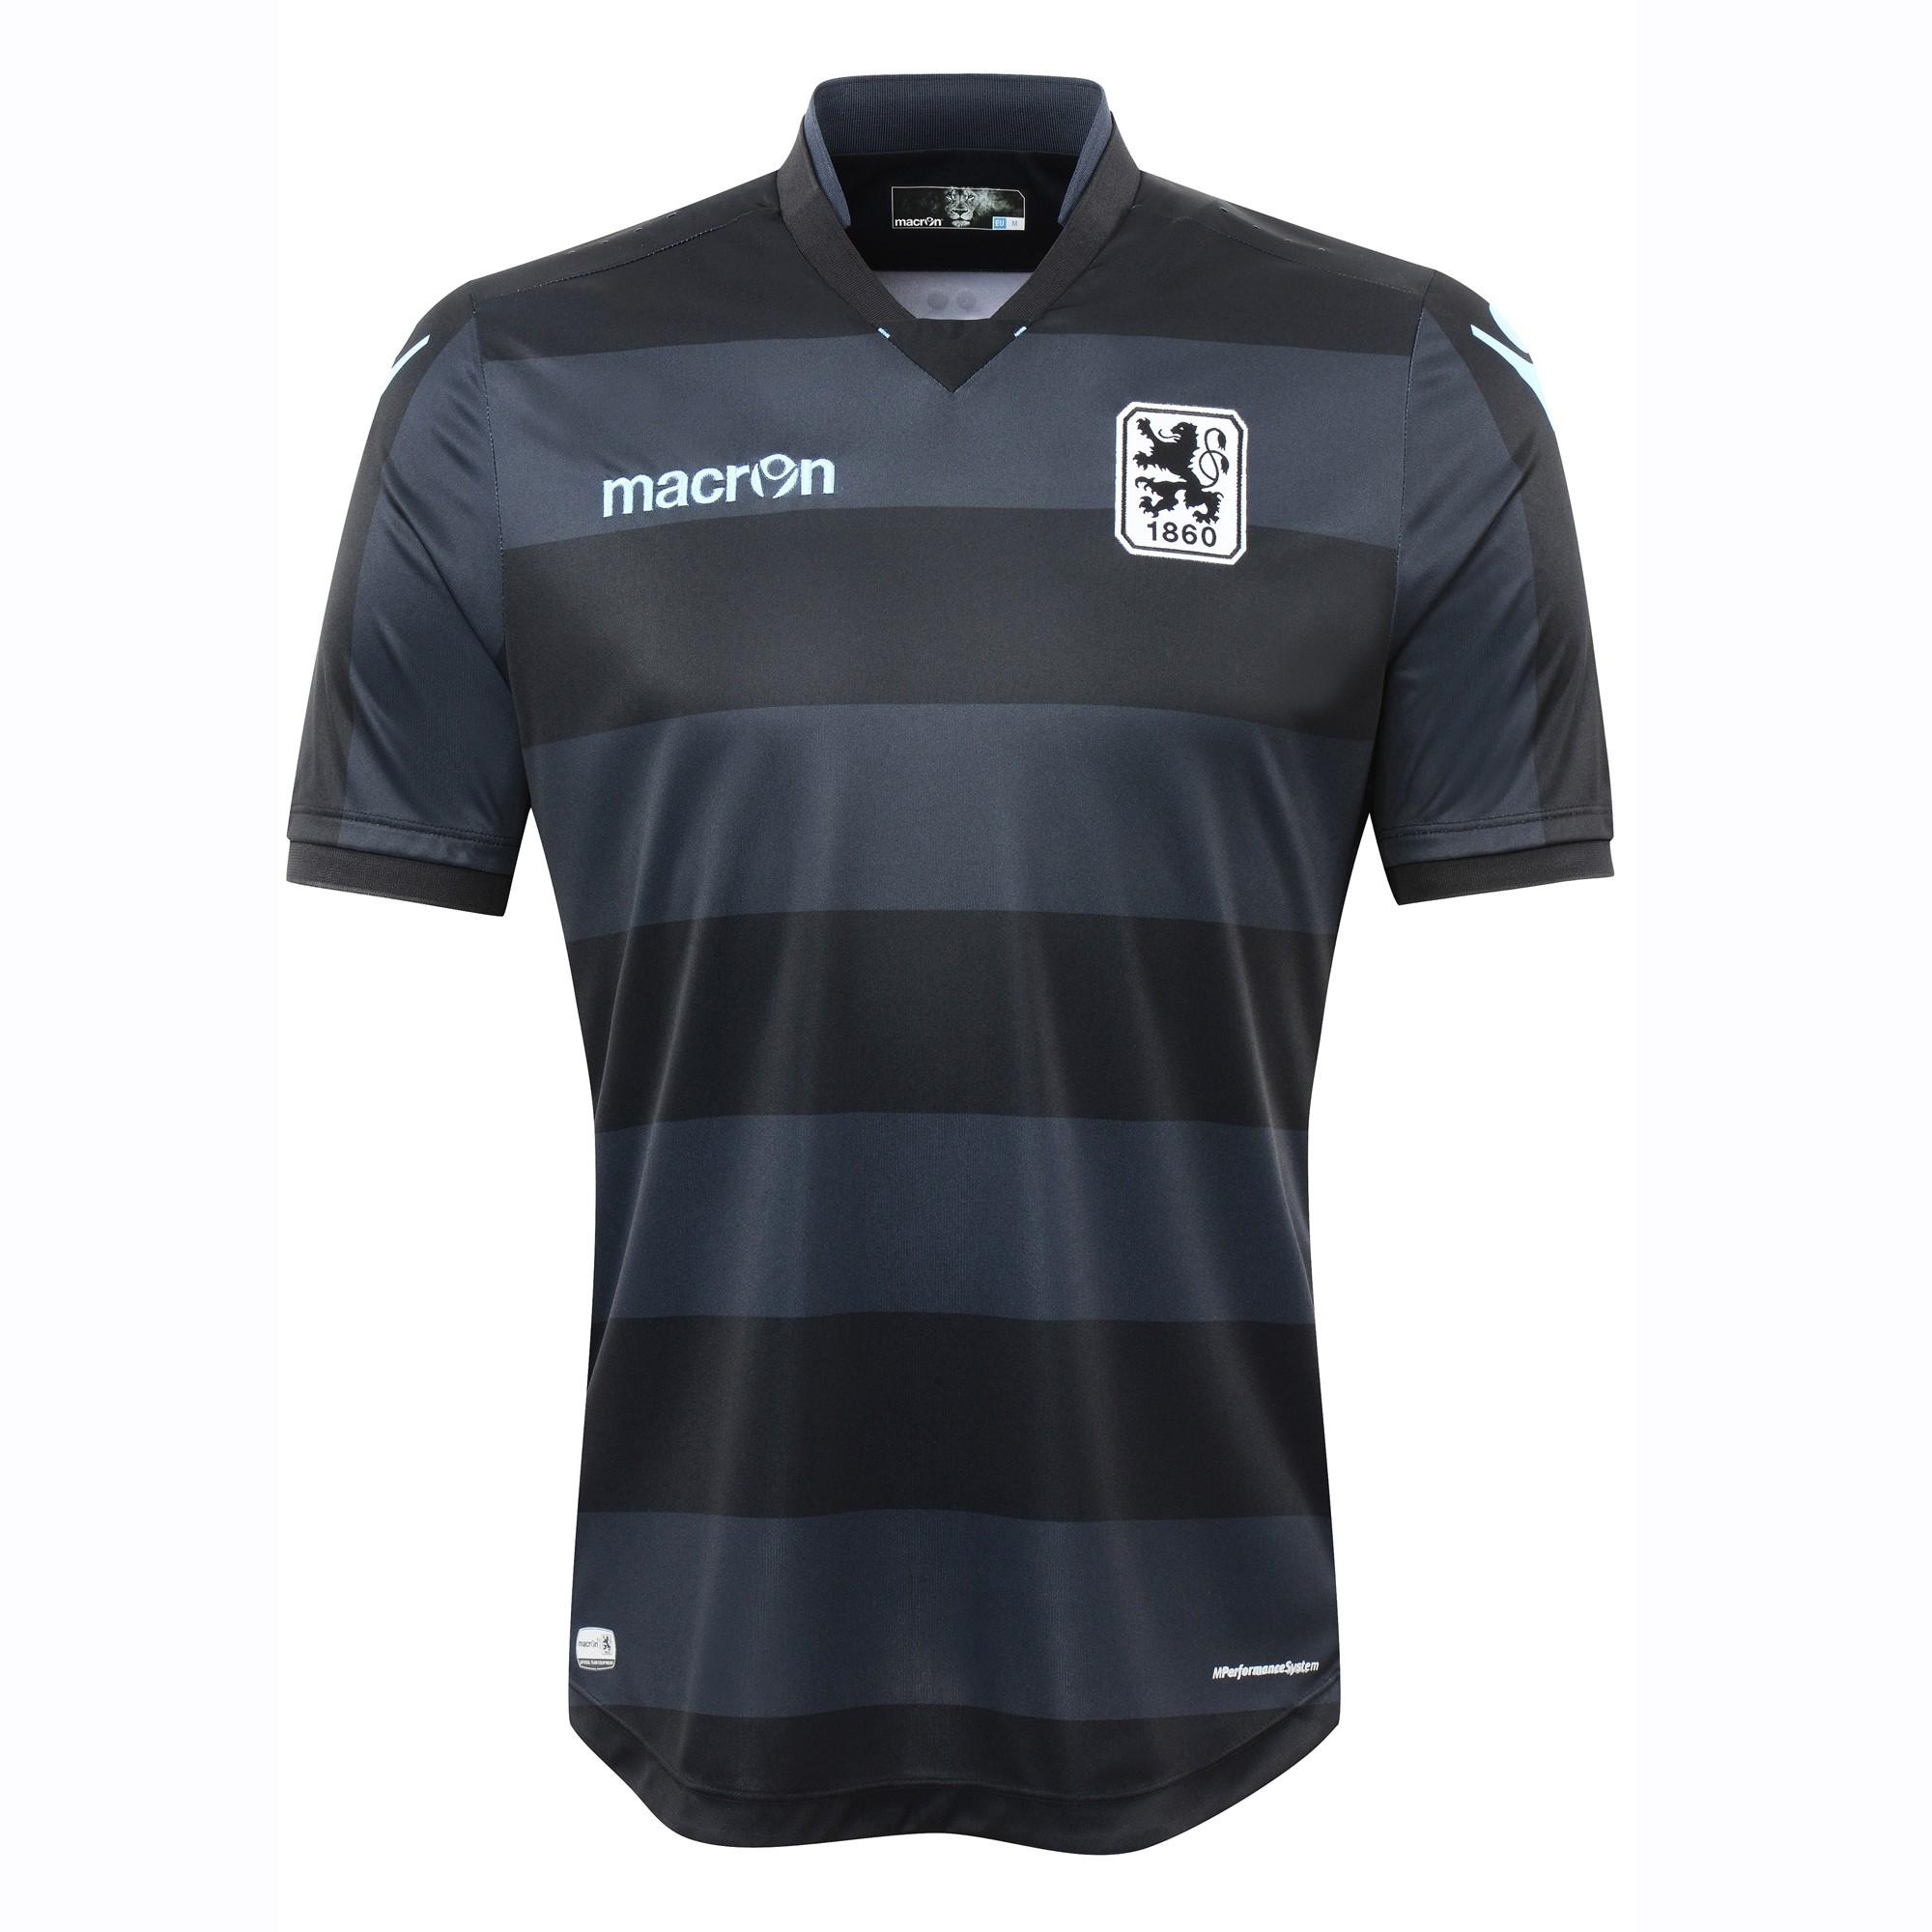 2016-2017 Munich 1860 Authentic Away Match Shirt